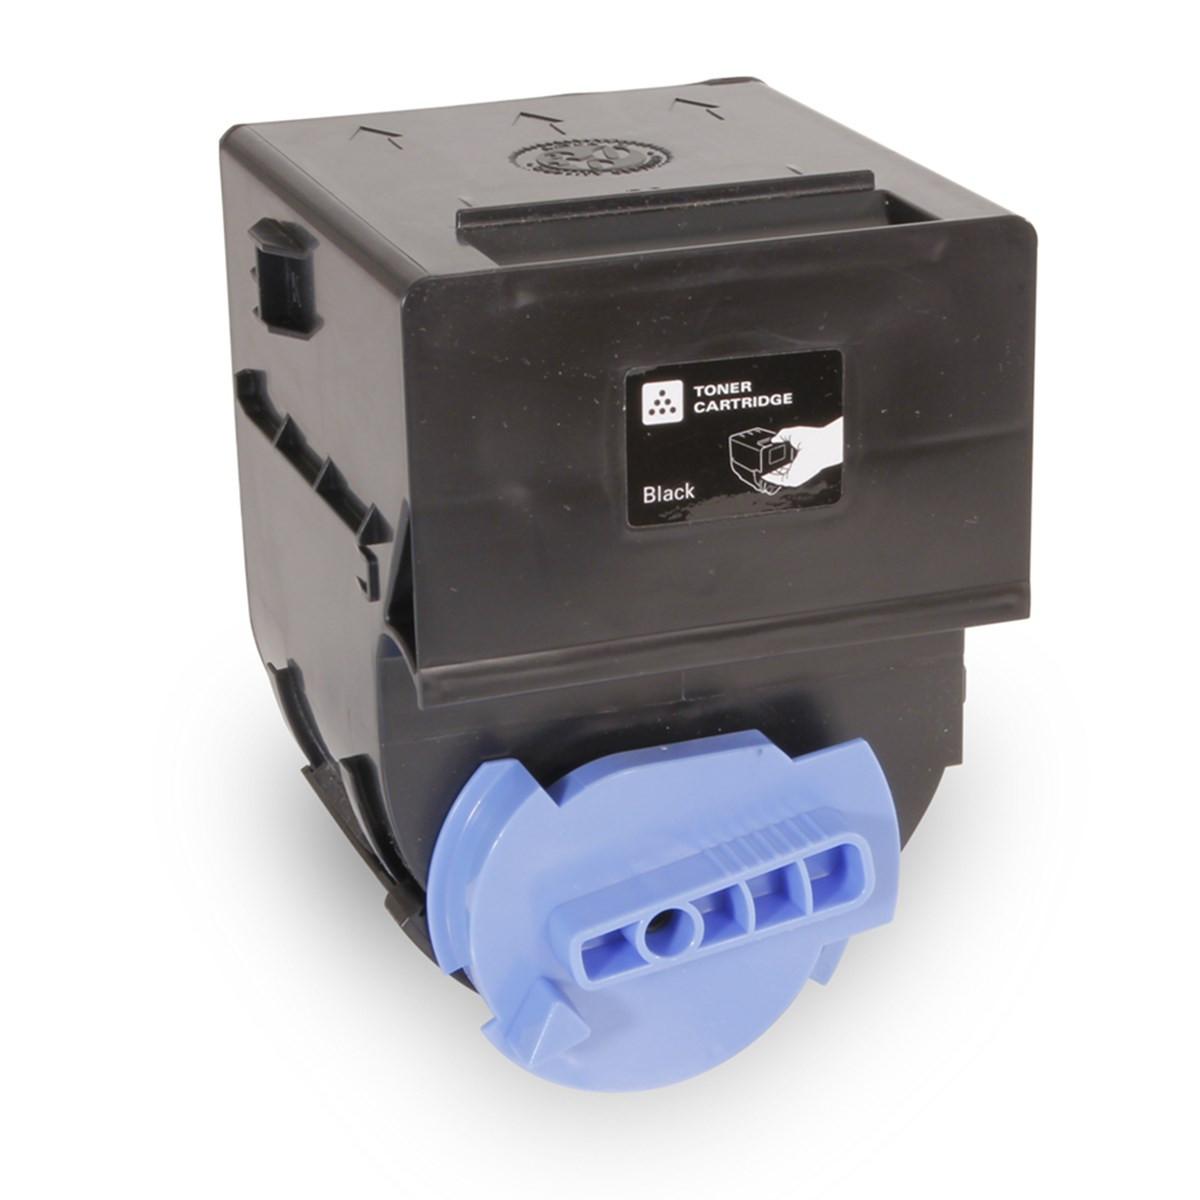 Toner Compatível com Canon GPR-23 Preto | IMAGERUNNER C2550 C2880 C3080 C3380 | Katun Access 575g